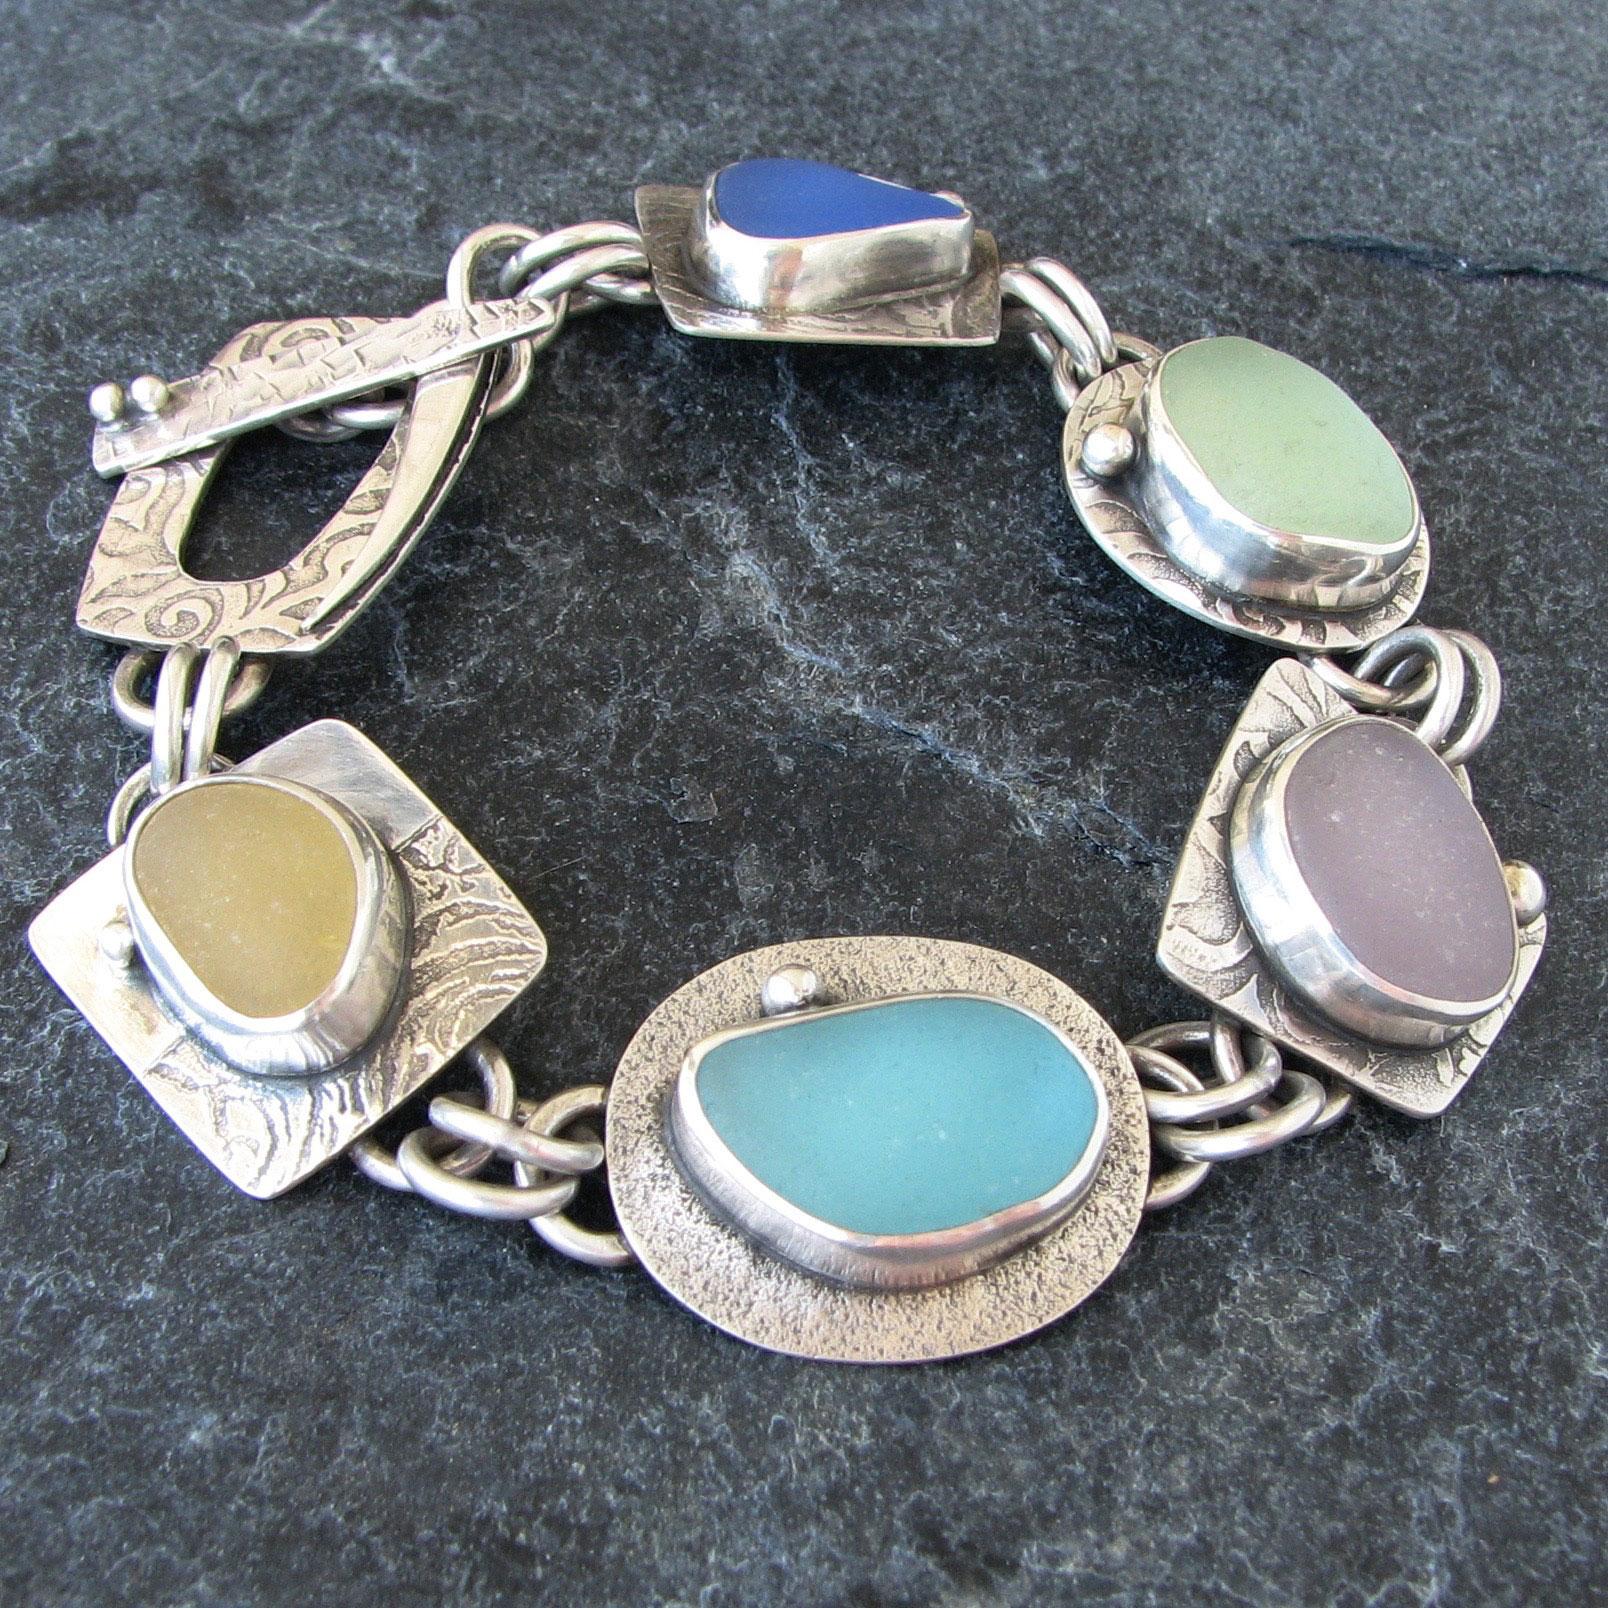 sea-glass-bracelet-monica-branstrom-studio.jpg